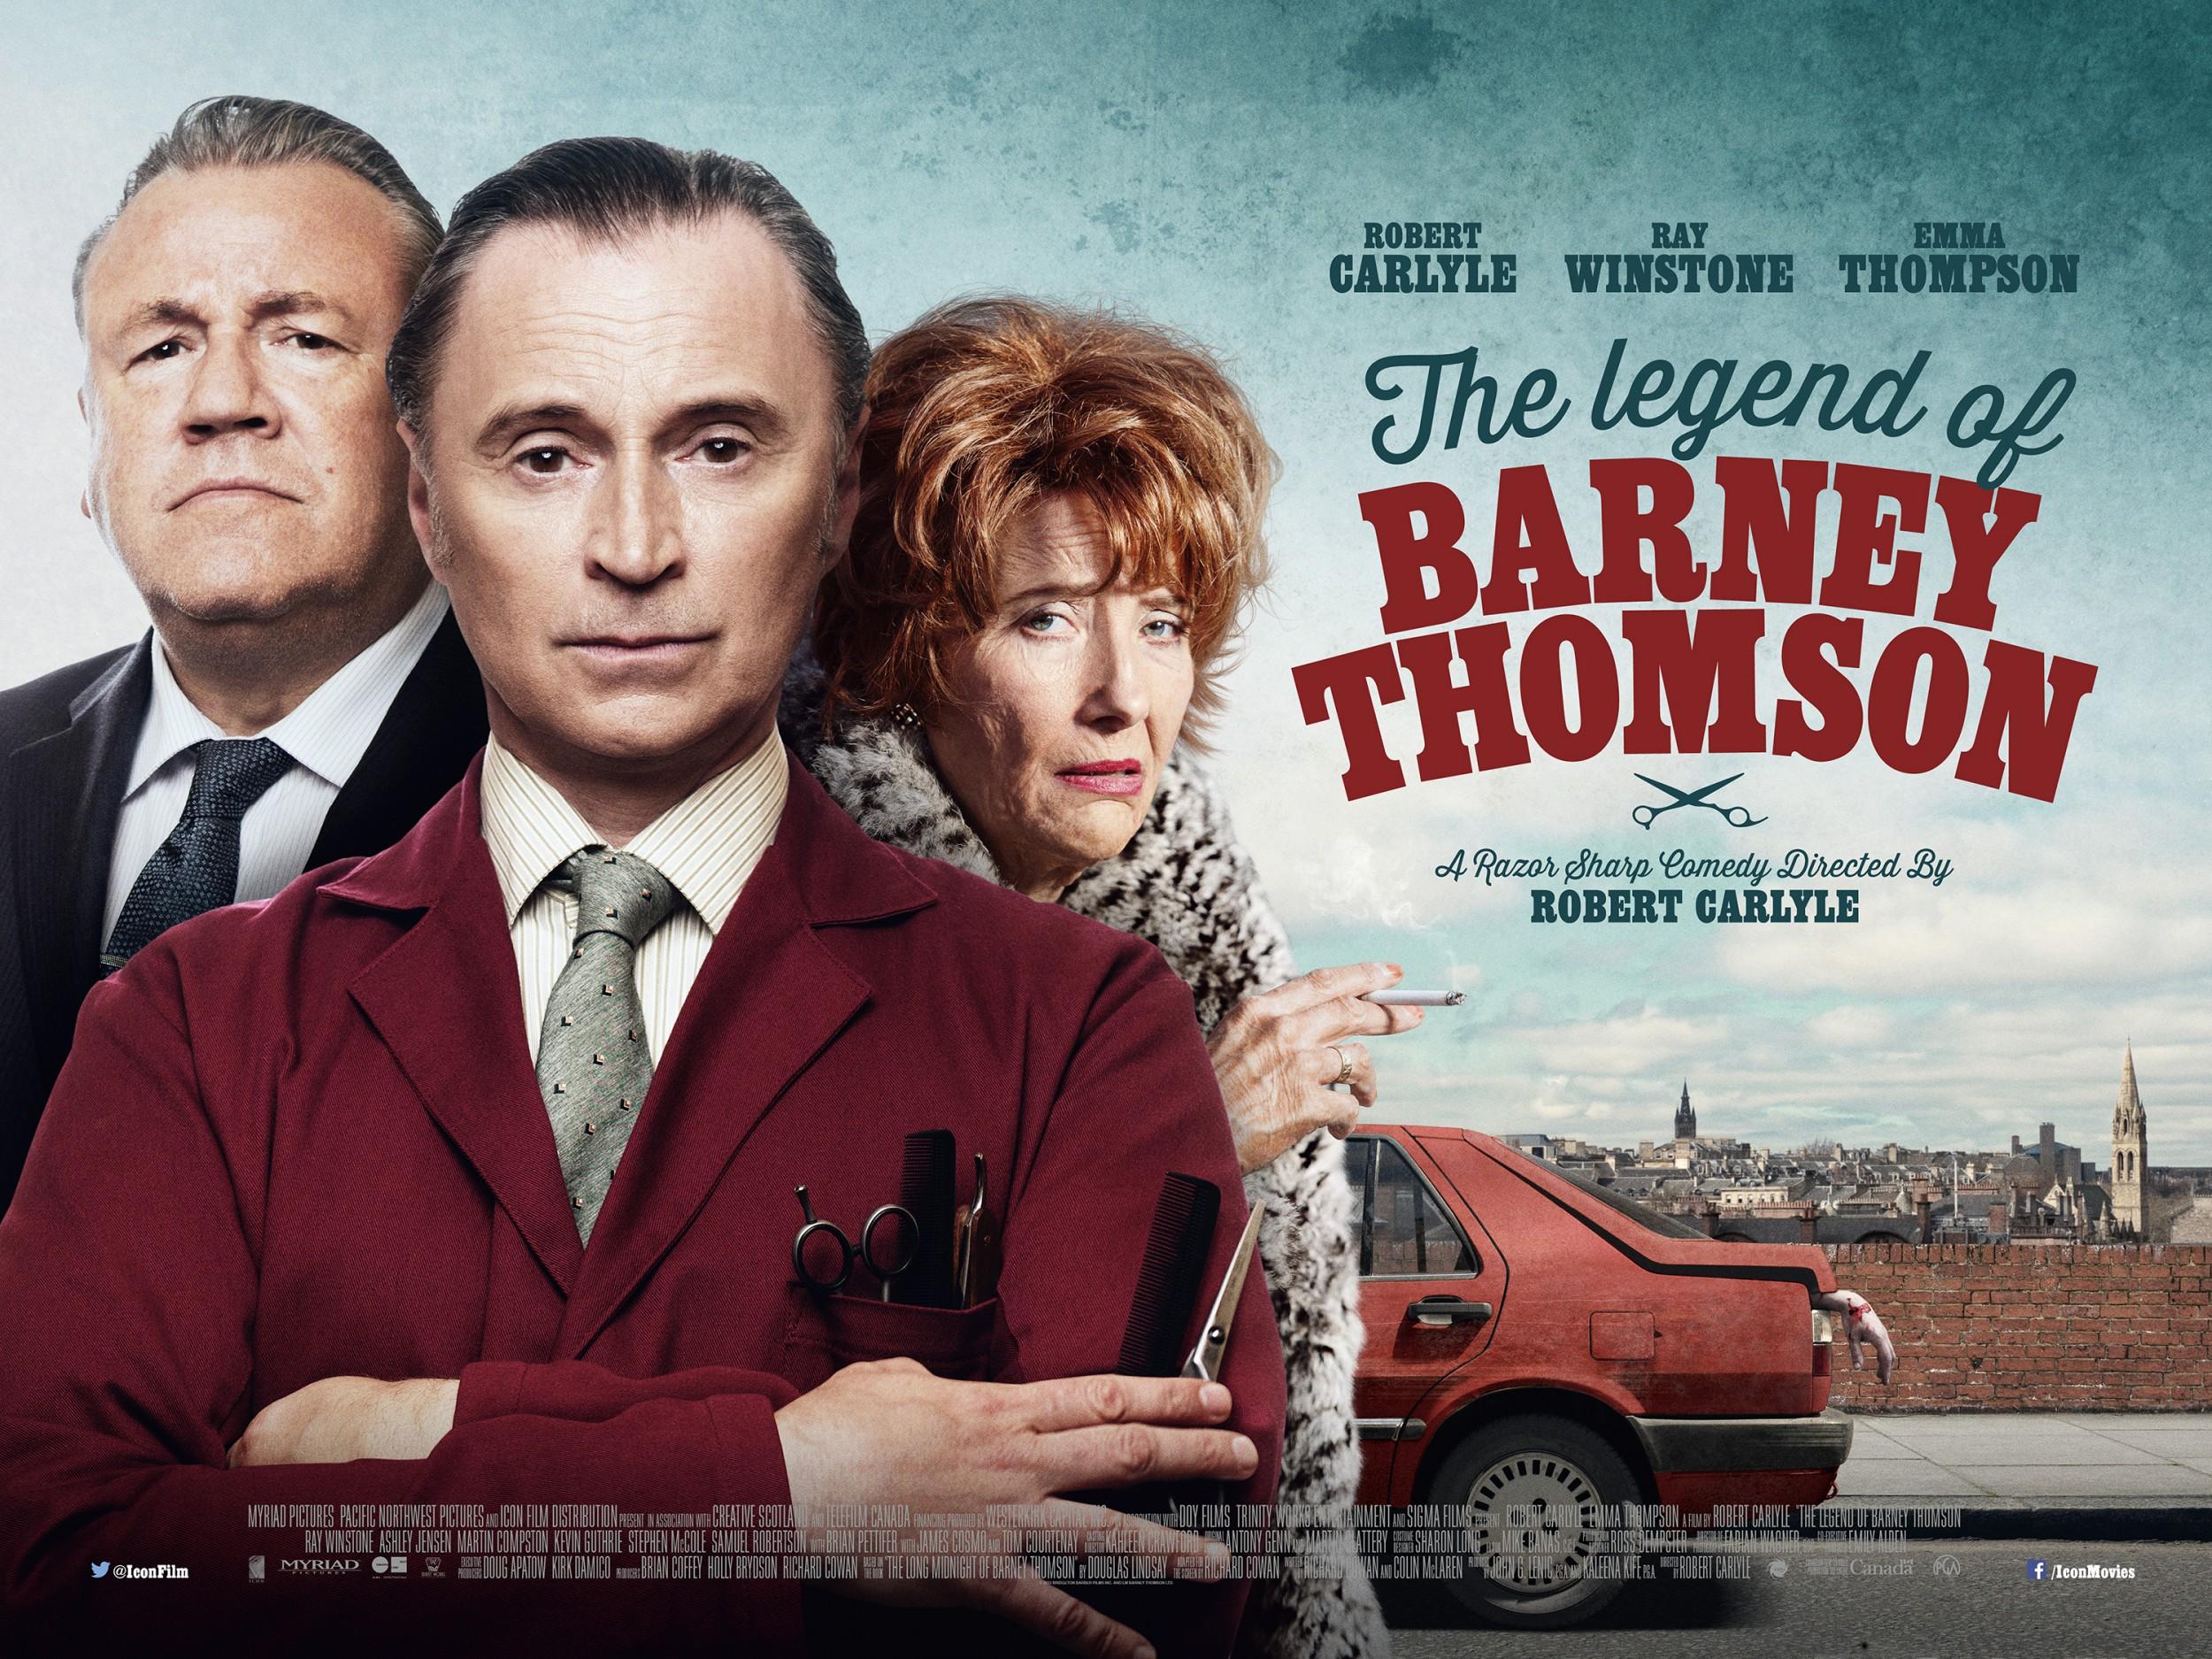 The-Legend-of-Barney-Thomson_poster_goldposter_com_1.jpg